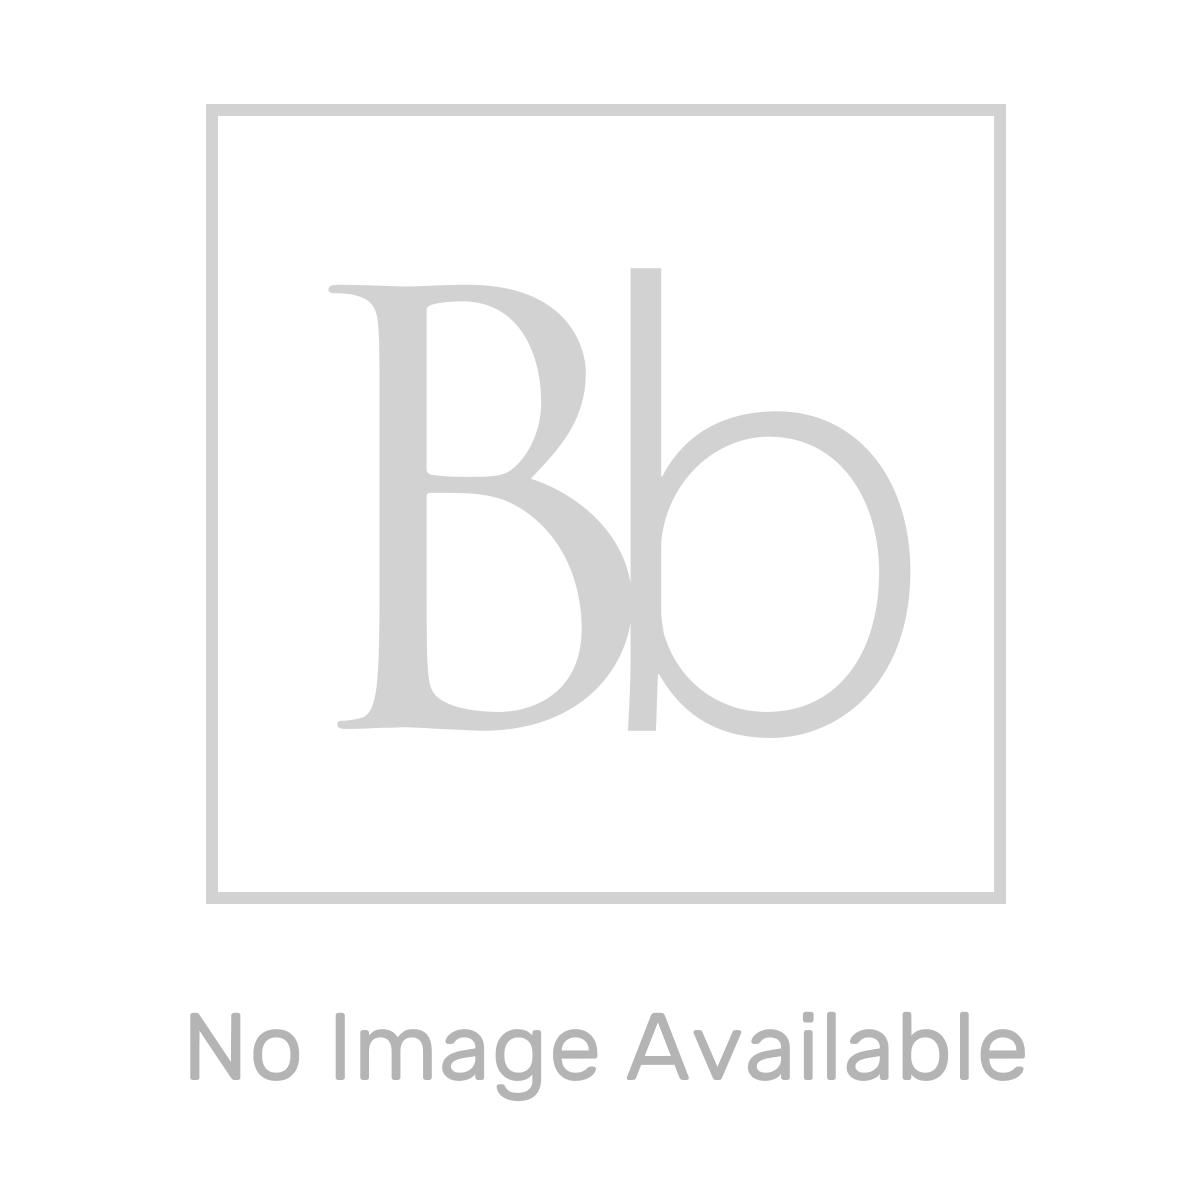 Nuie Athena Hacienda Black 2 Drawer Floor Standing Vanity Unit with 50mm Profile Basin 600mm